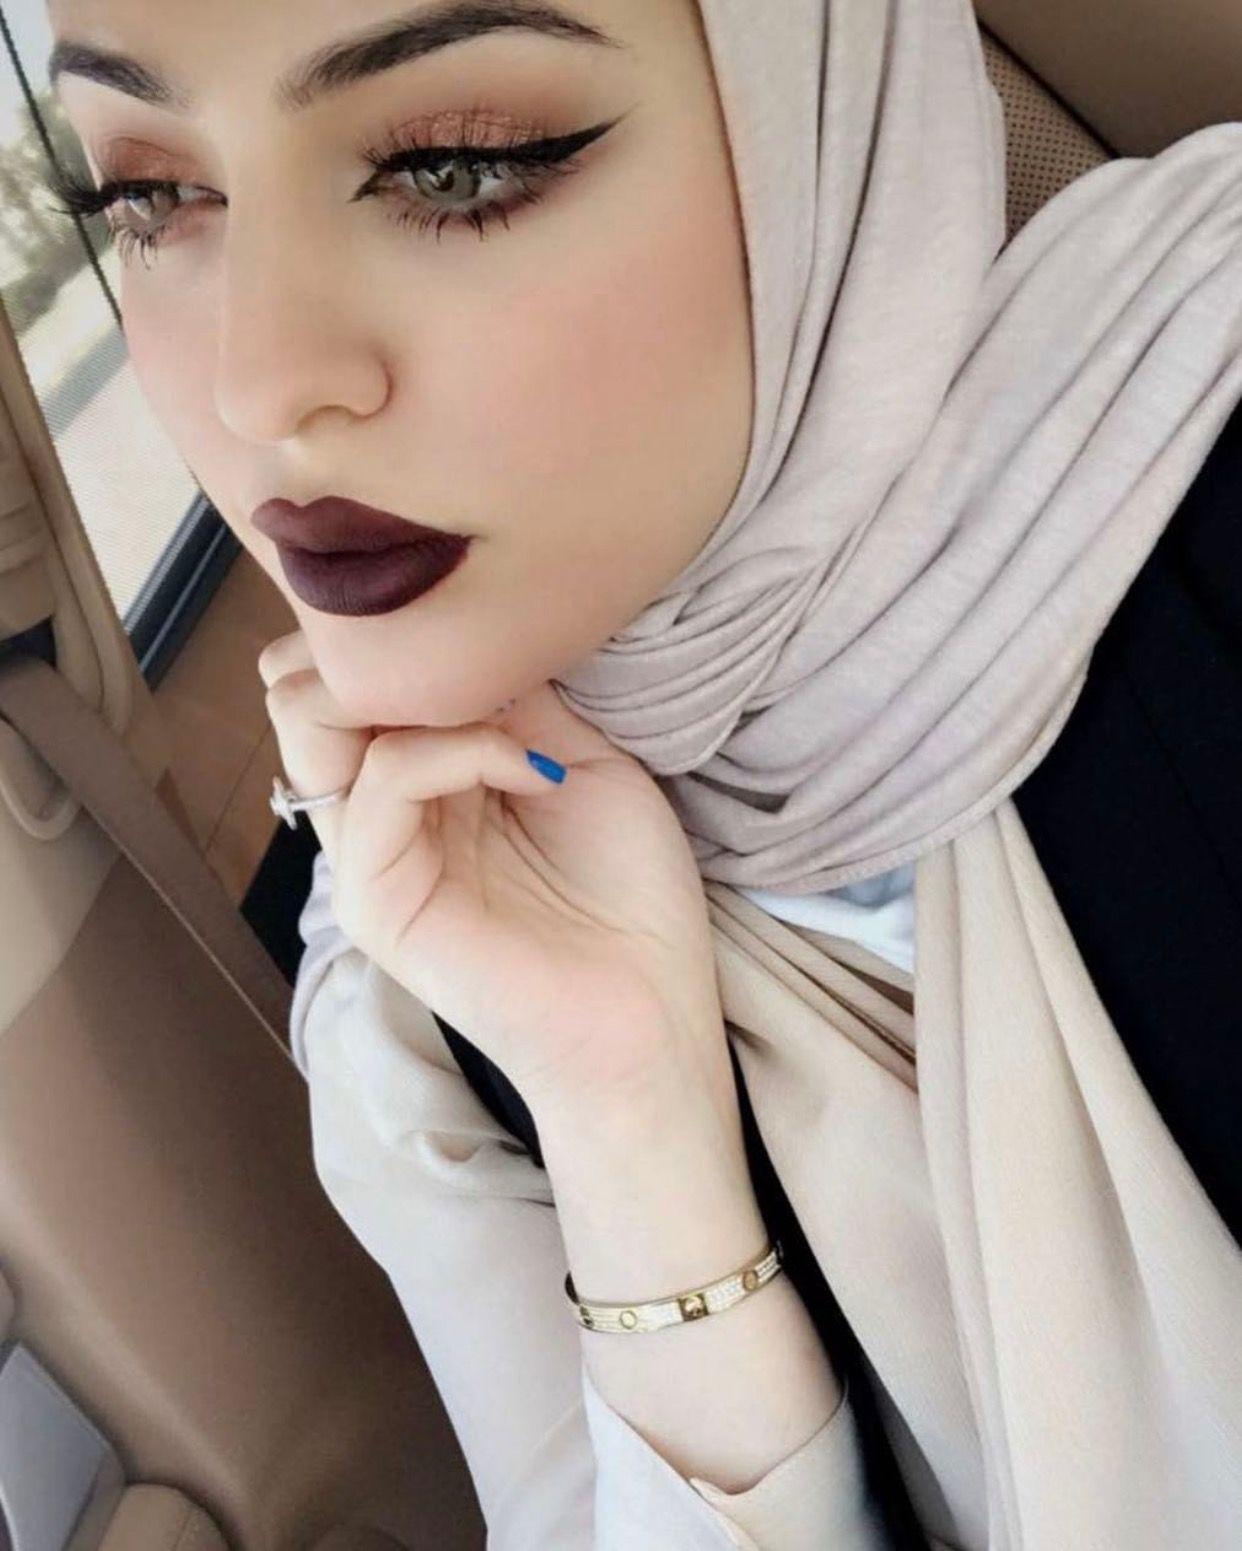 احلى صور بنات محجبات , رمزيات رائعه لفتيات بالحجاب